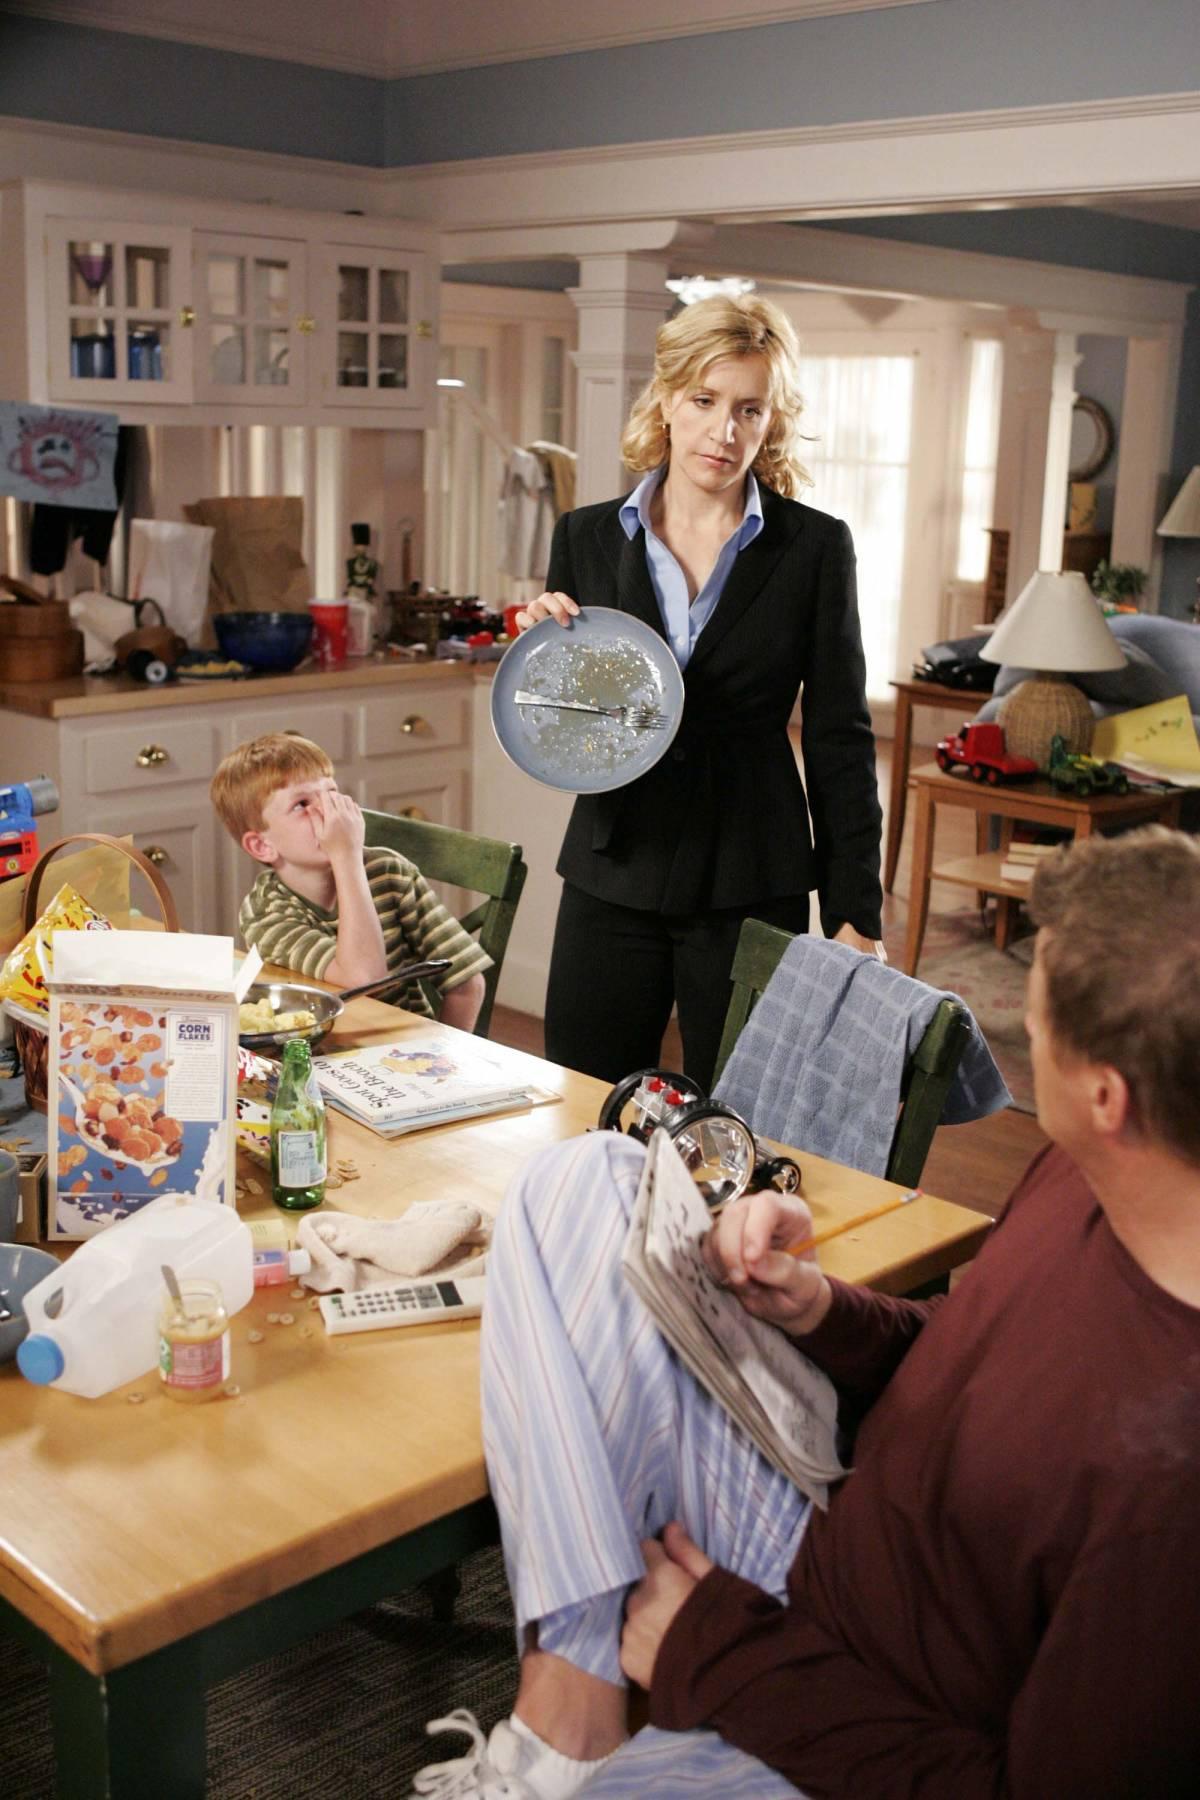 Contrordine femminista: le donne in cucina